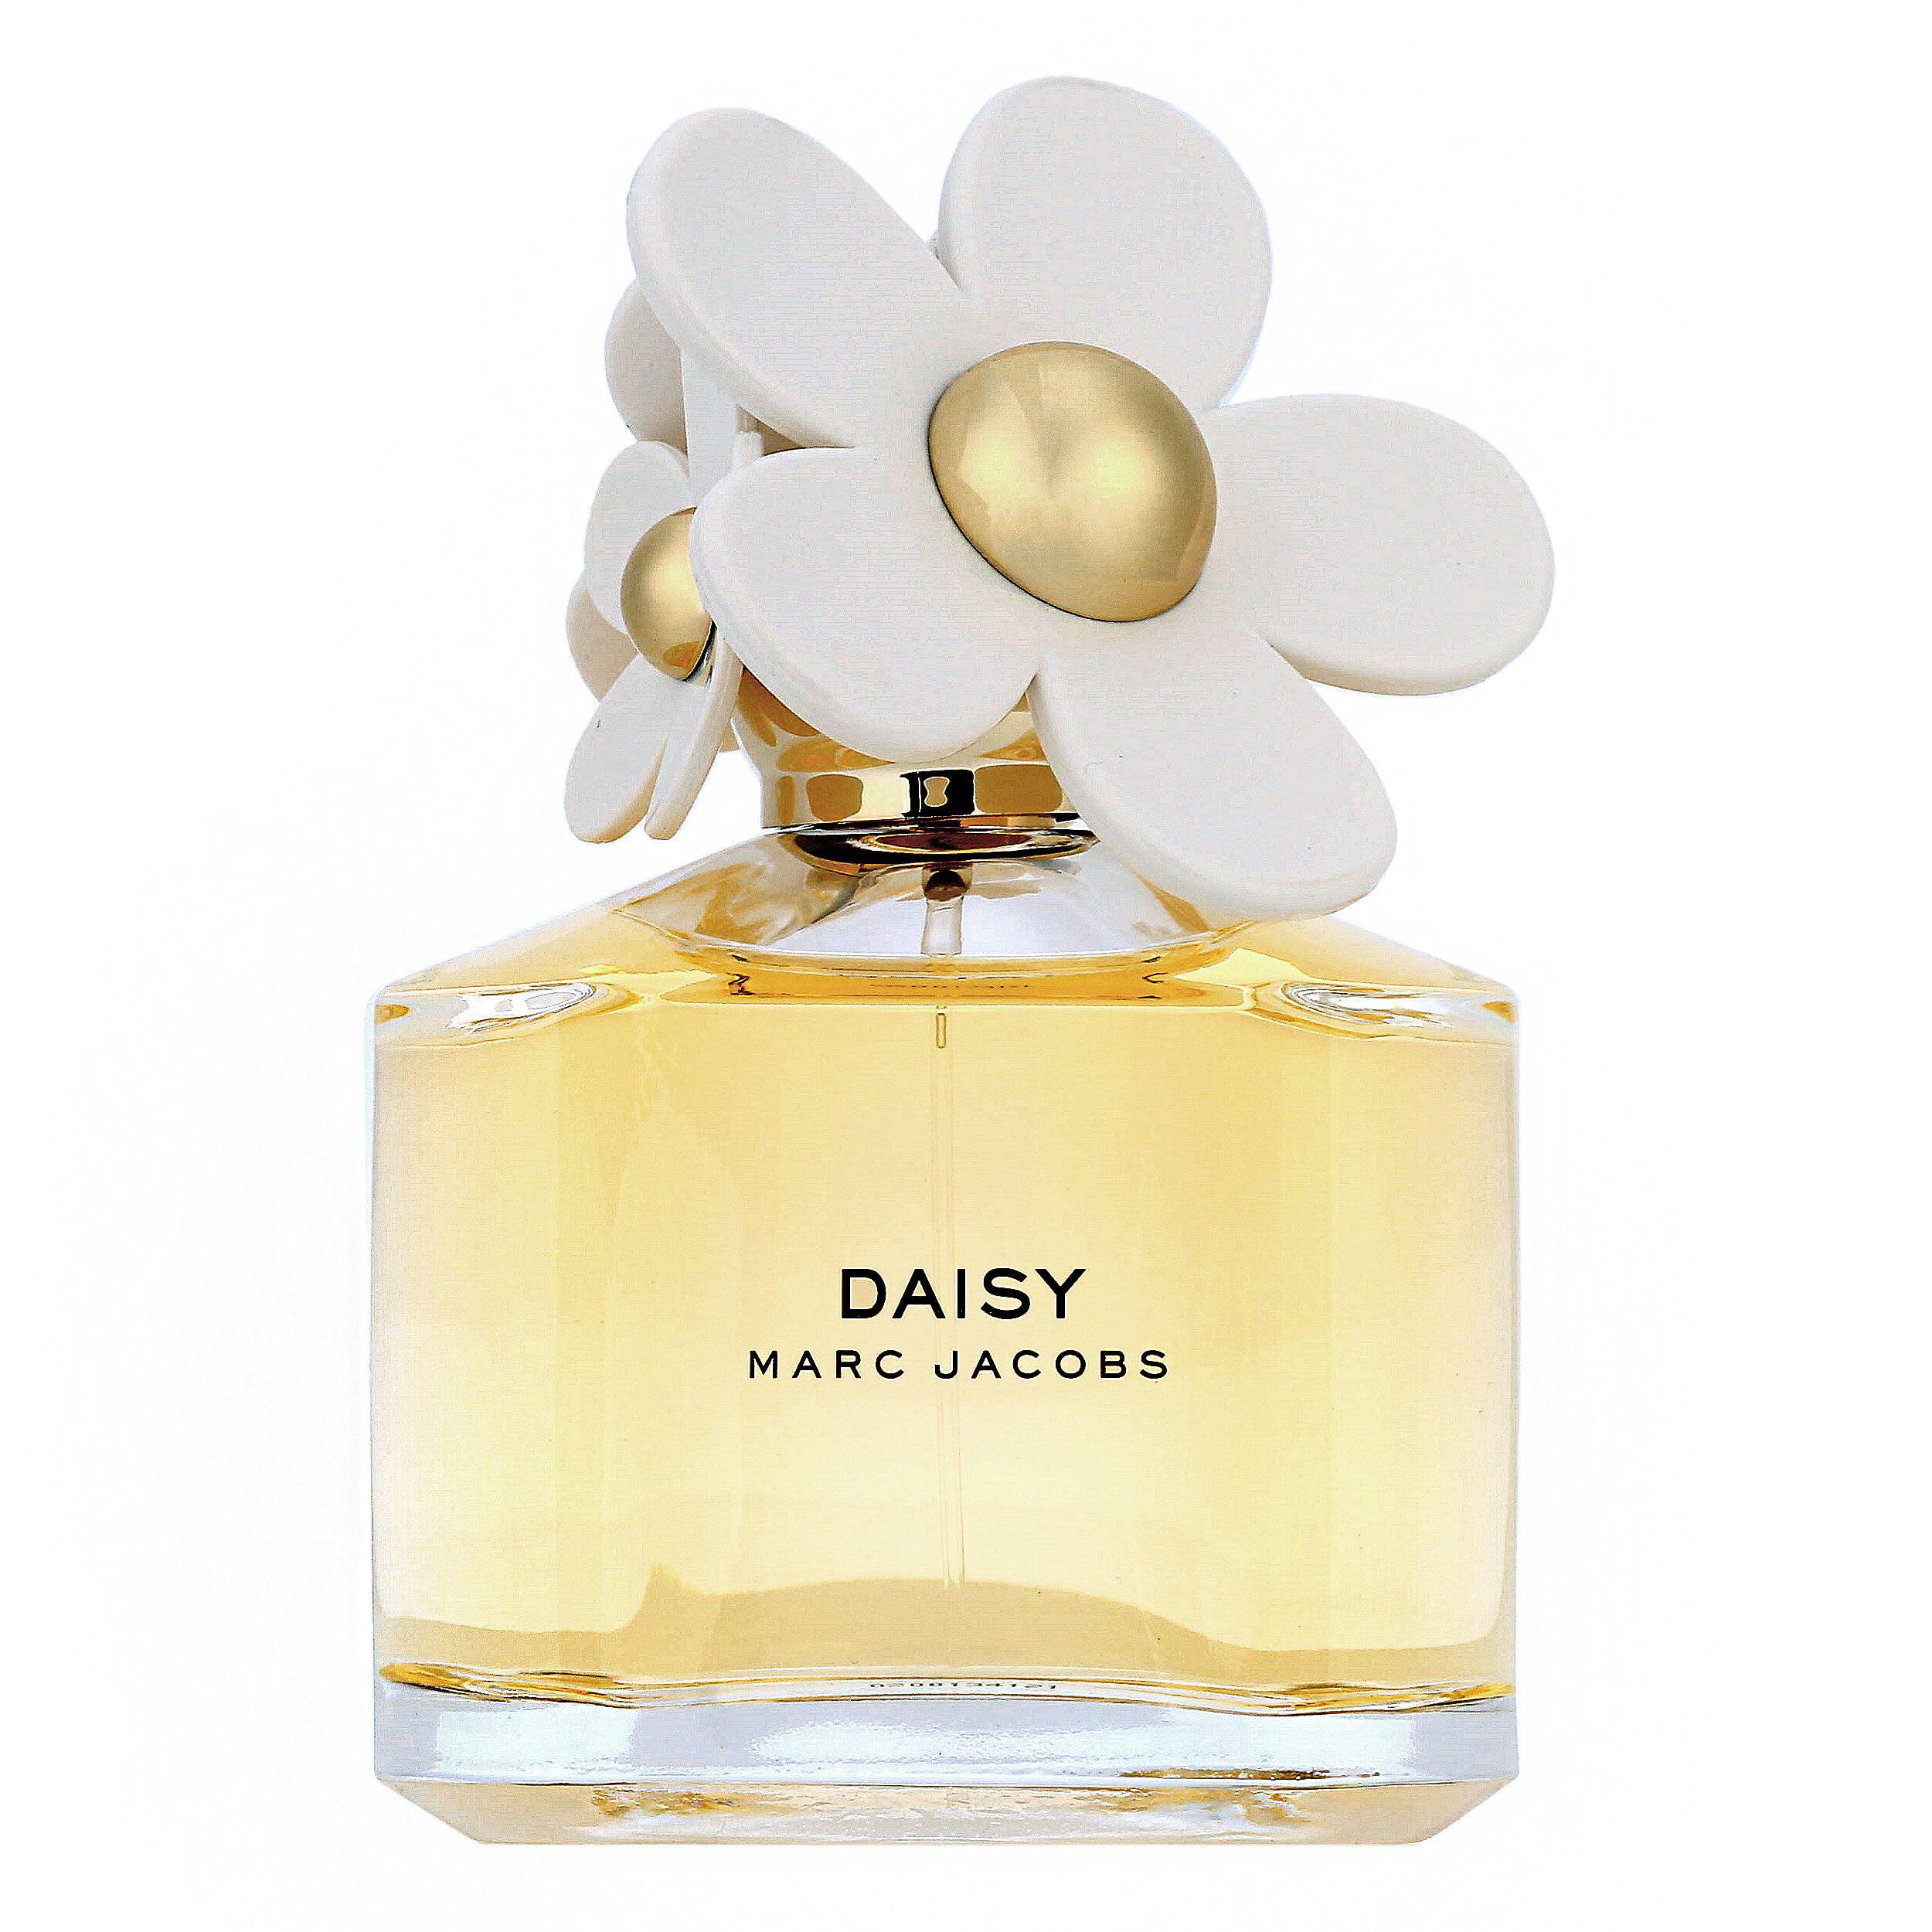 Marc Jacobs - Marc Jacobs Daisy Eau de Toilette Spray, Perfume for Women,  3.4 Oz - Walmart.com - Walmart.com